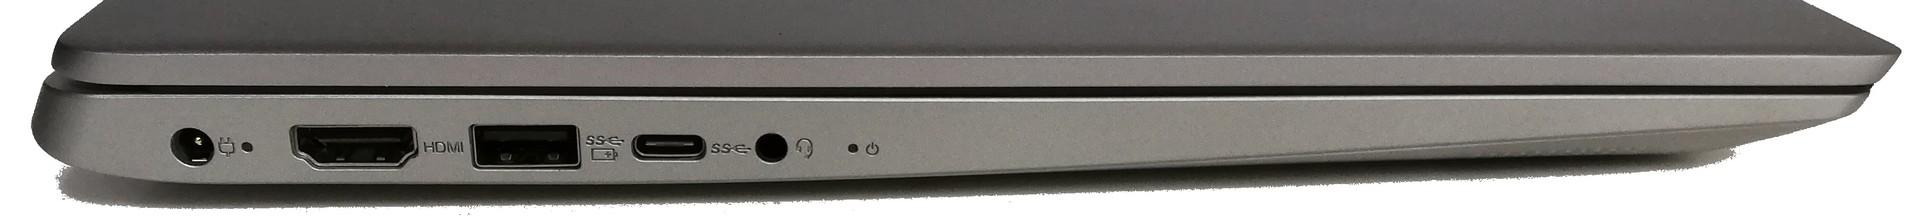 Lenovo IdeaPad 330S-15IKB (i5-8250U, UHD620) Laptop Review